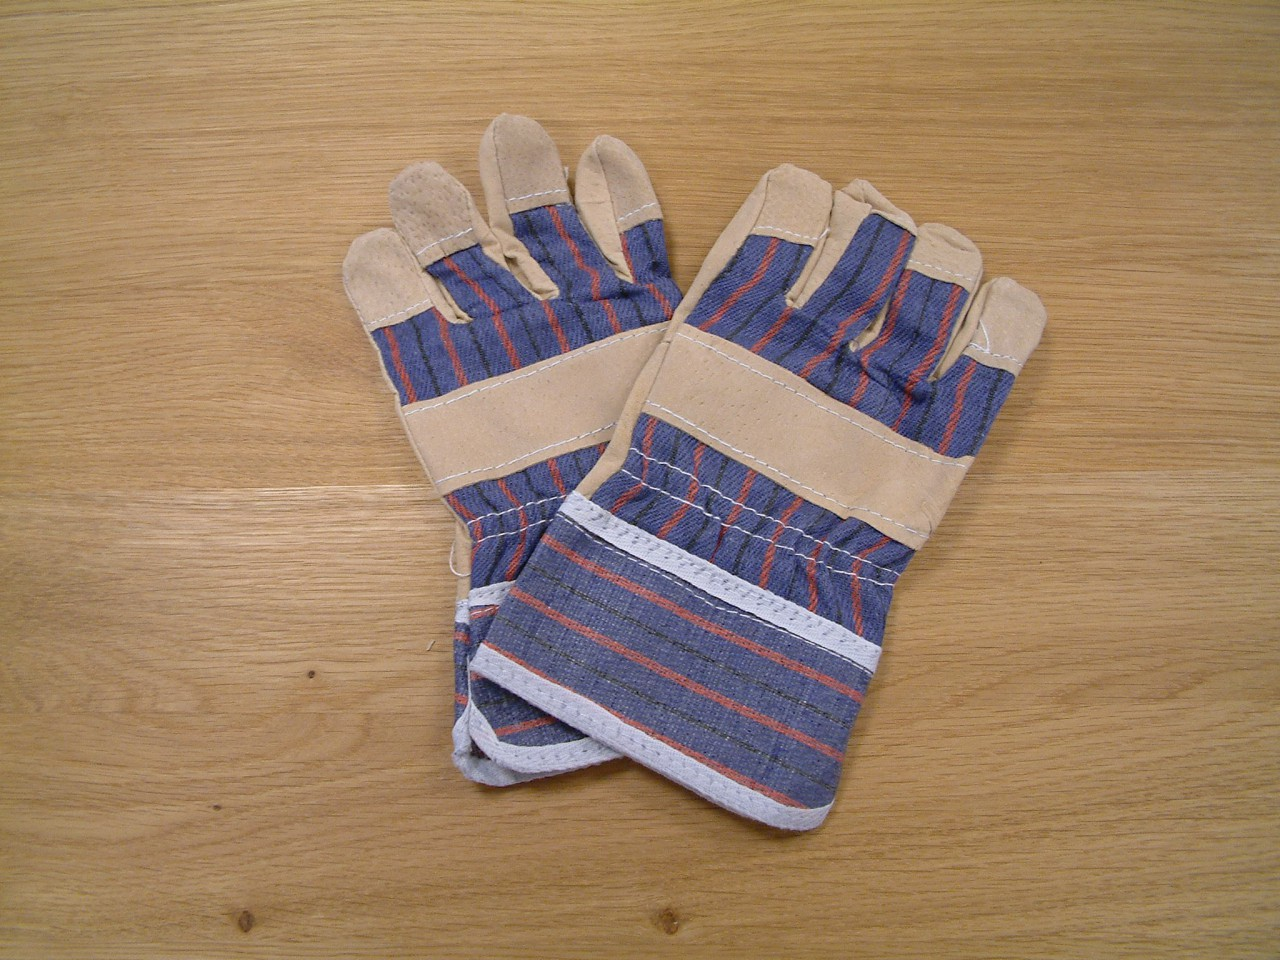 arbeitshandschuhe f r kinder 1 paar farbe blau beige gr e 7 5 ma eines handschuhs. Black Bedroom Furniture Sets. Home Design Ideas